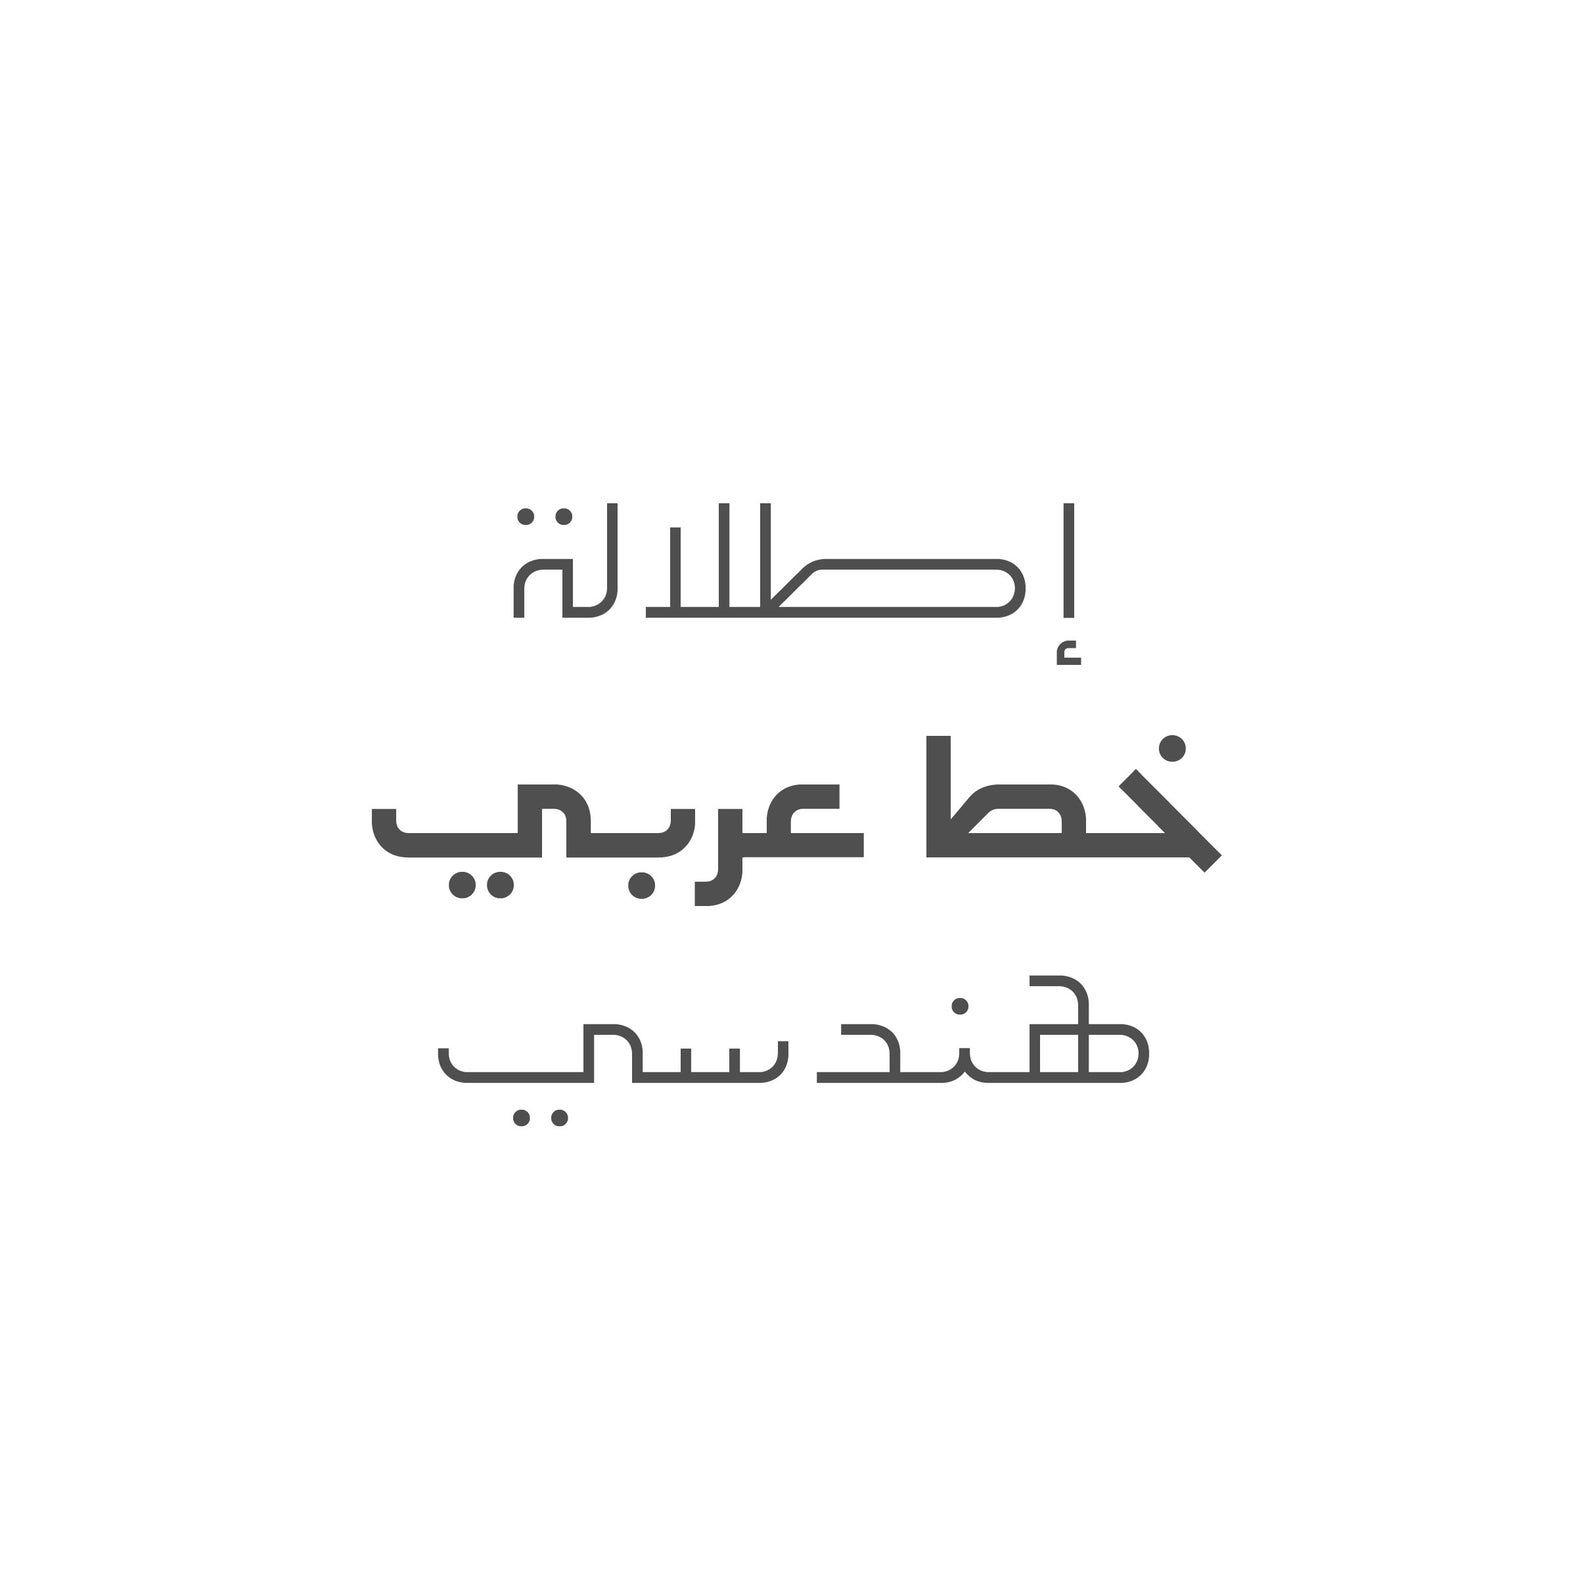 Etlalah Arabic Font Arabic Calligraphy Font Islamic Etsy In 2020 Arabic Calligraphy Fonts Arabic Font Arabic Script